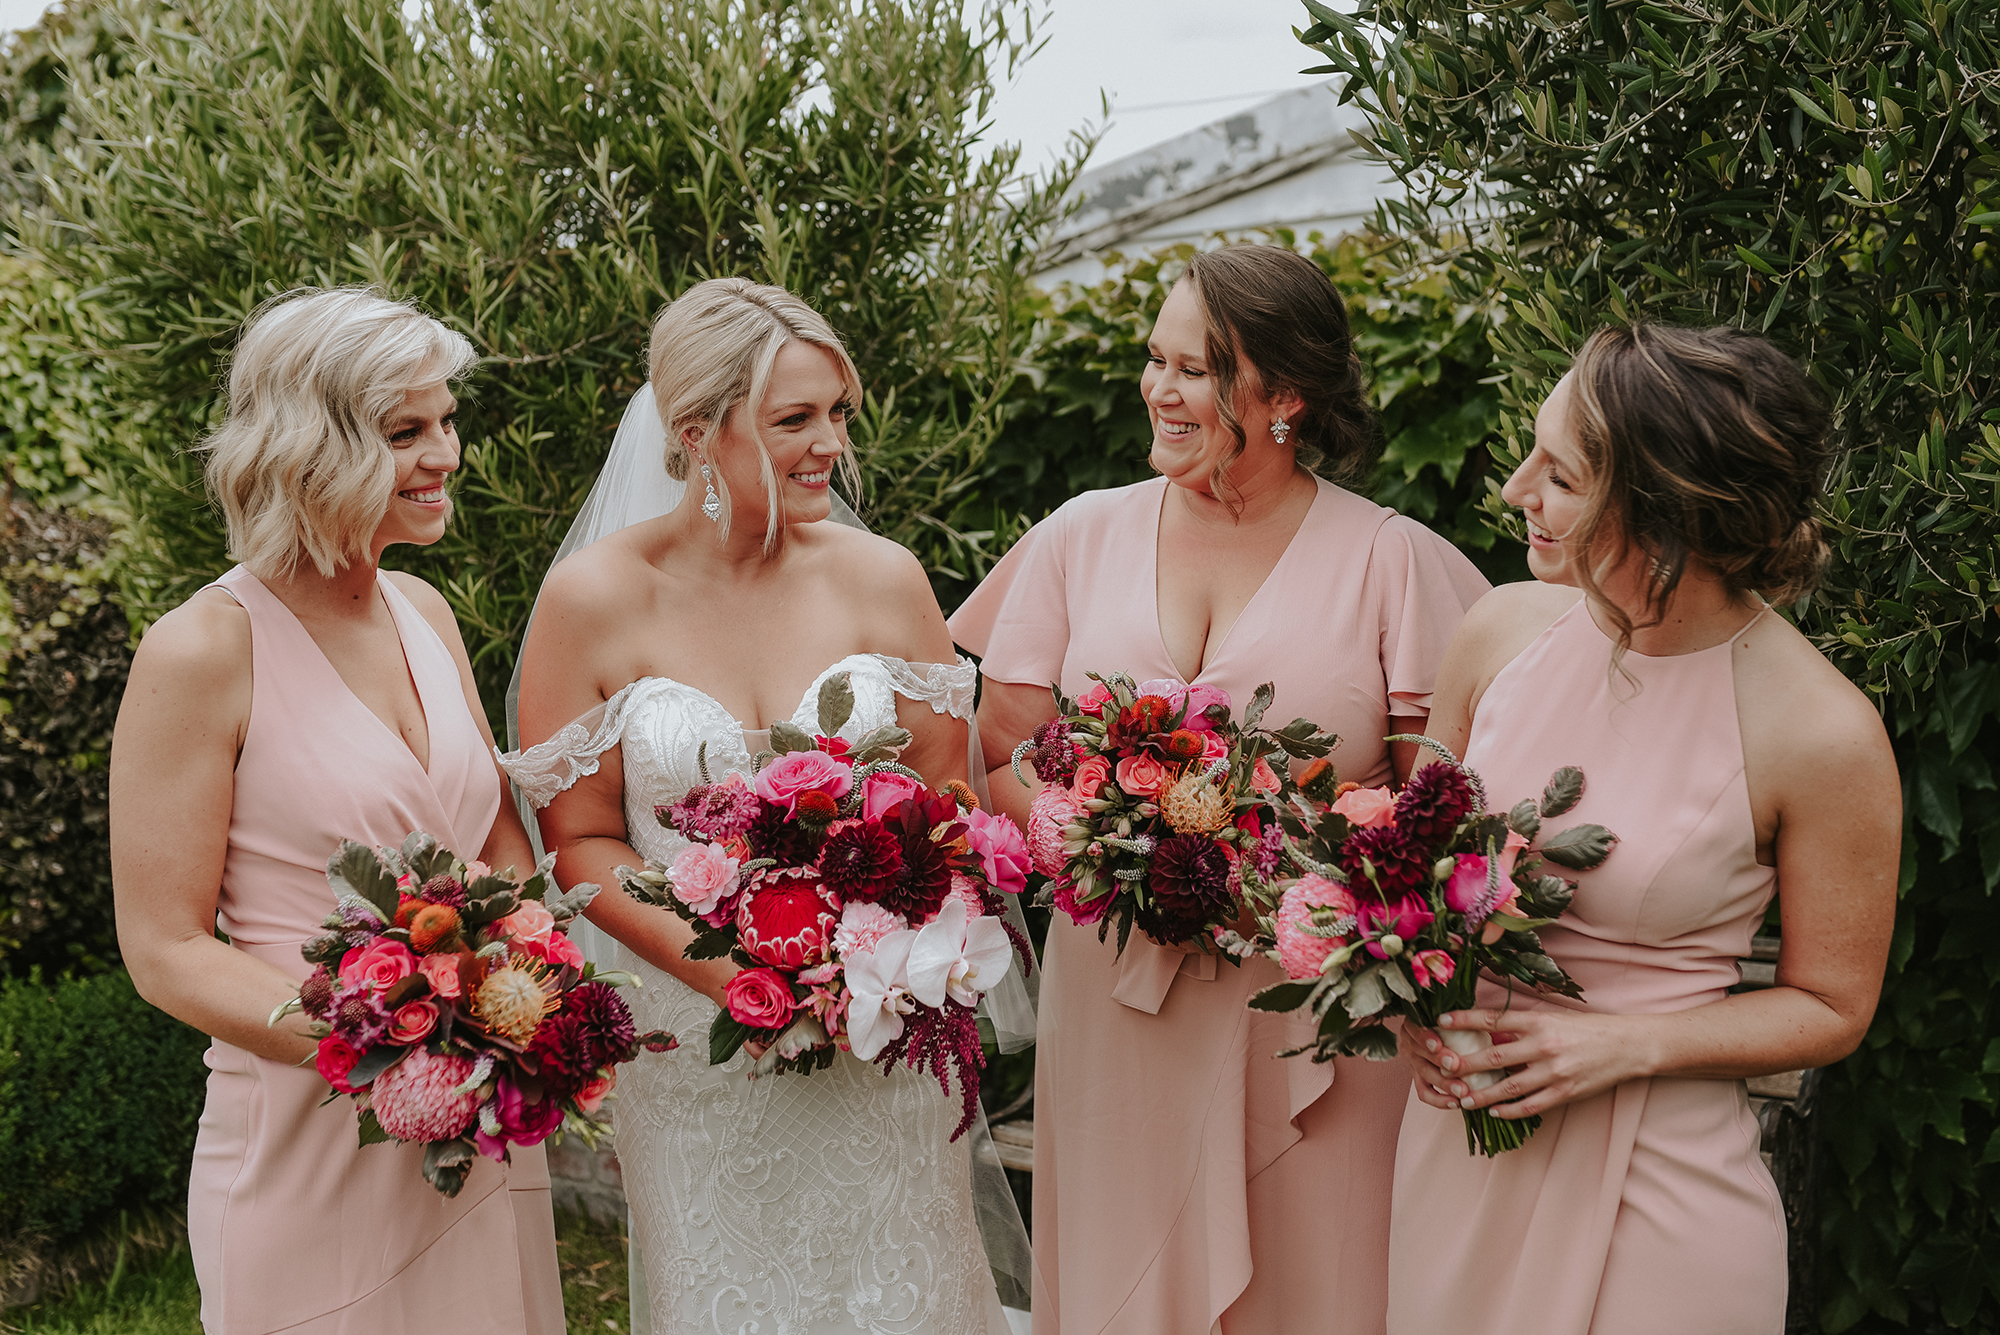 Smitten wedding photography (5)